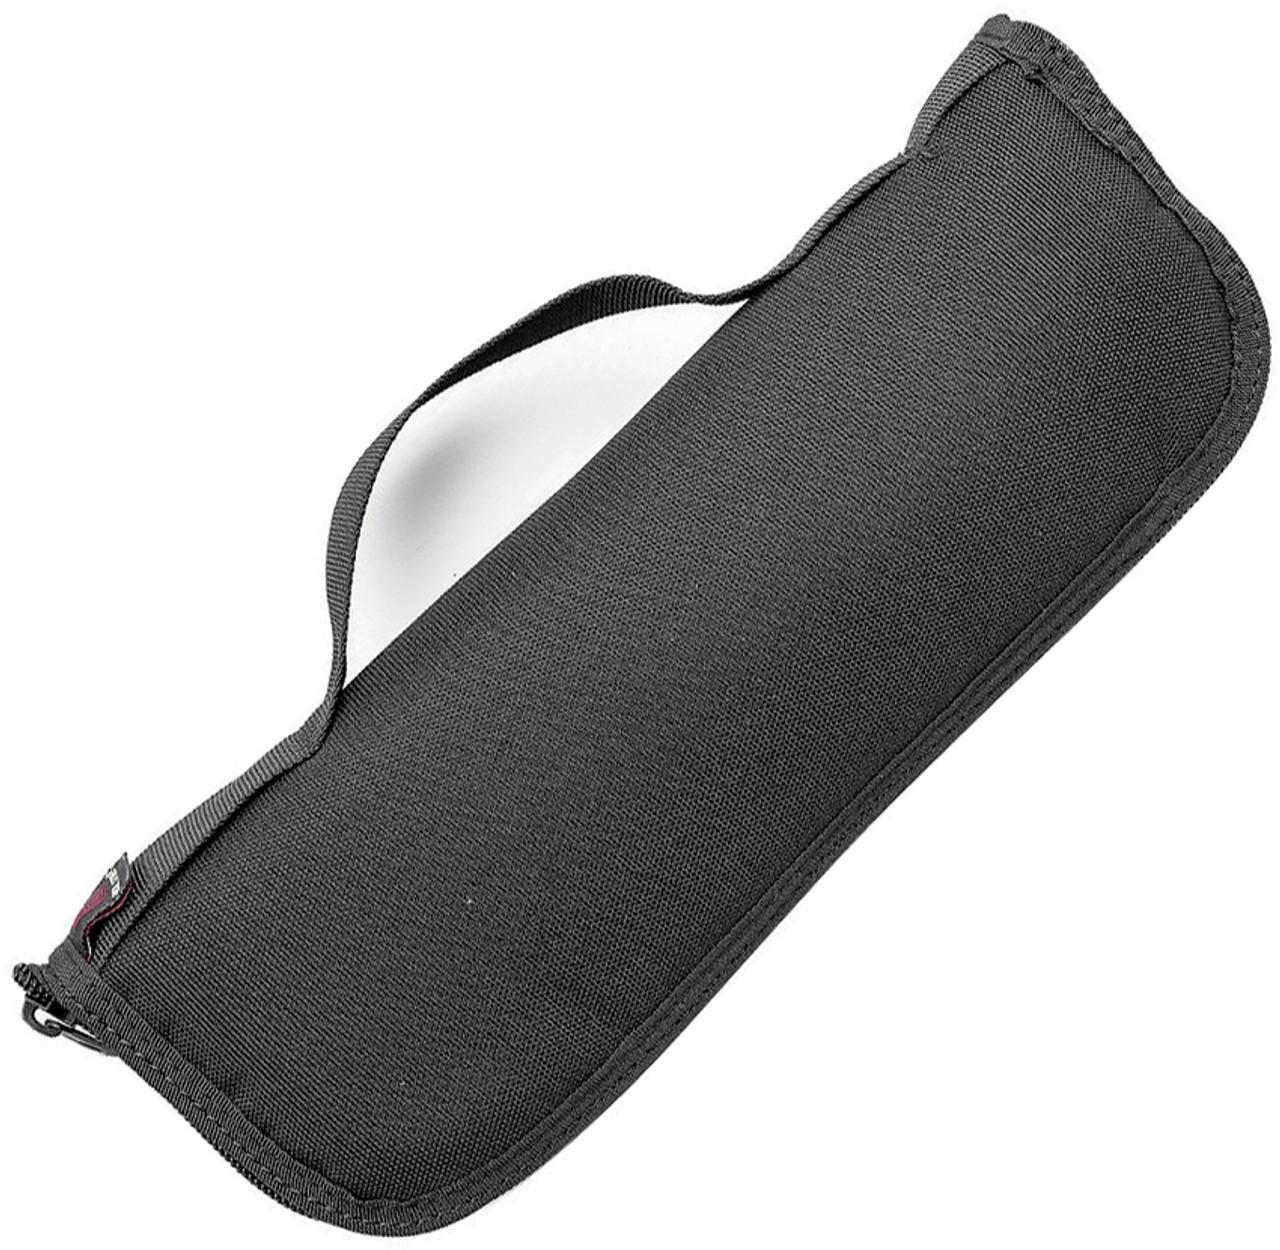 Urban Discreet XL EDC Bag